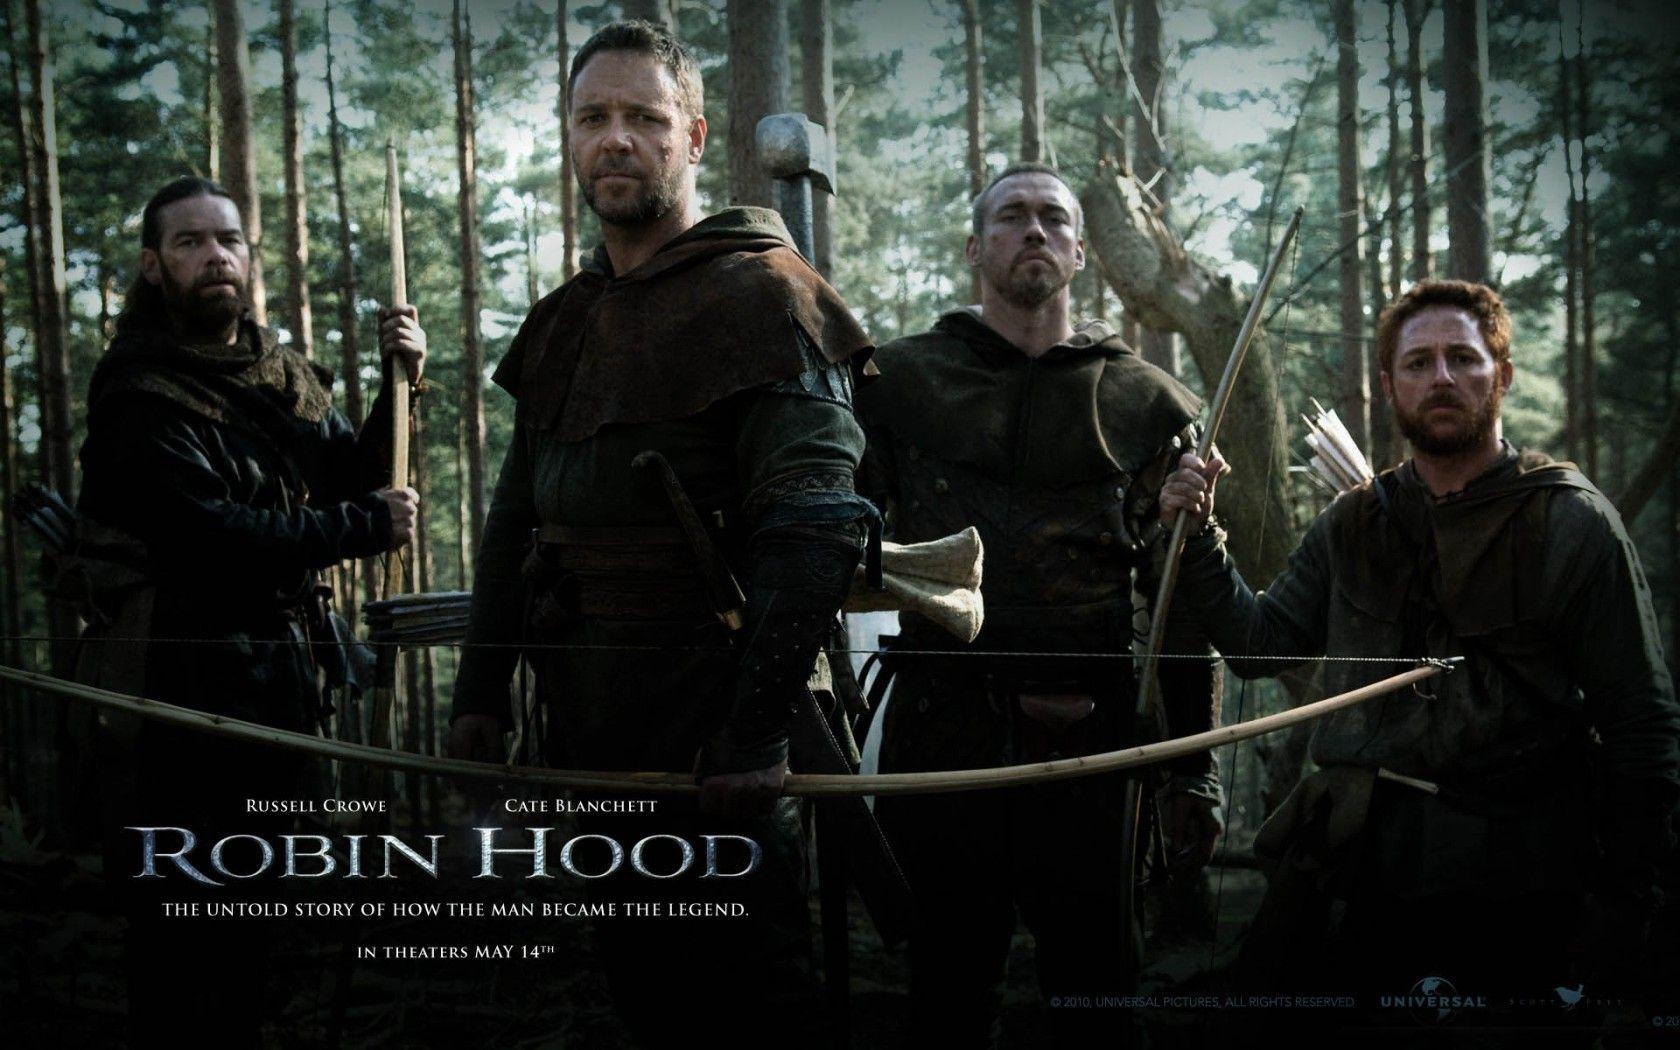 robin hood movie pics | Robin Hood, 2010 Movie - Wallpapersus.com